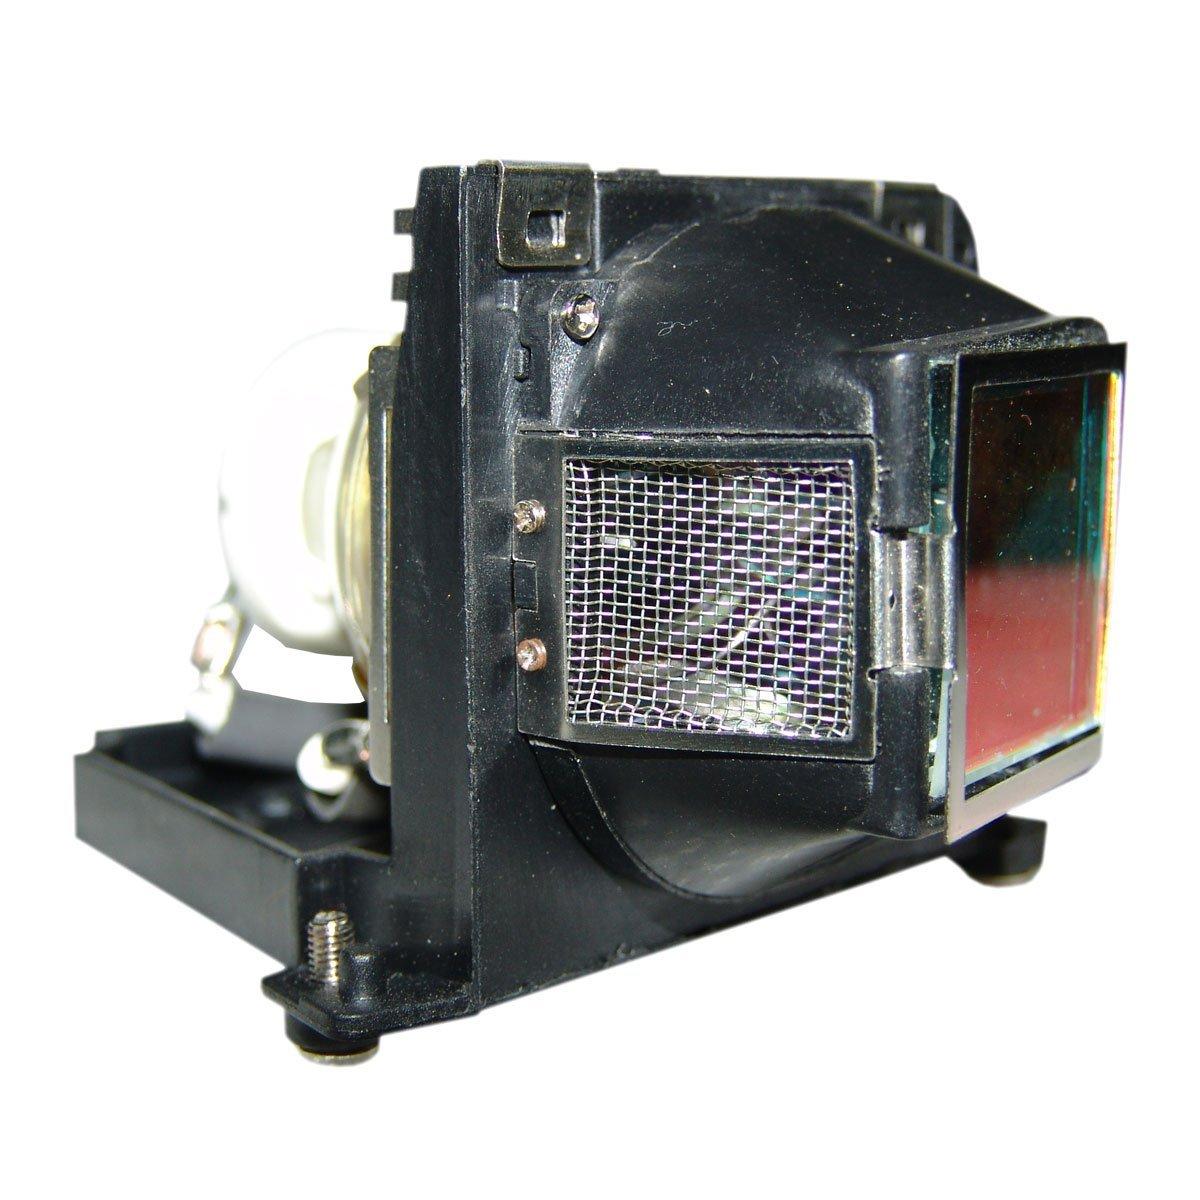 VLT-XD205LP XD205LP For Mitsubishi SD205 SD205R SD205U XD205 XD205U XD205R XD205U-G Projector Lamp Bulb With housing free shipping high quality projector bulb only vlt xd205lp for mitsubishi md 330s md 330x xd205 projectors 150 day warranty